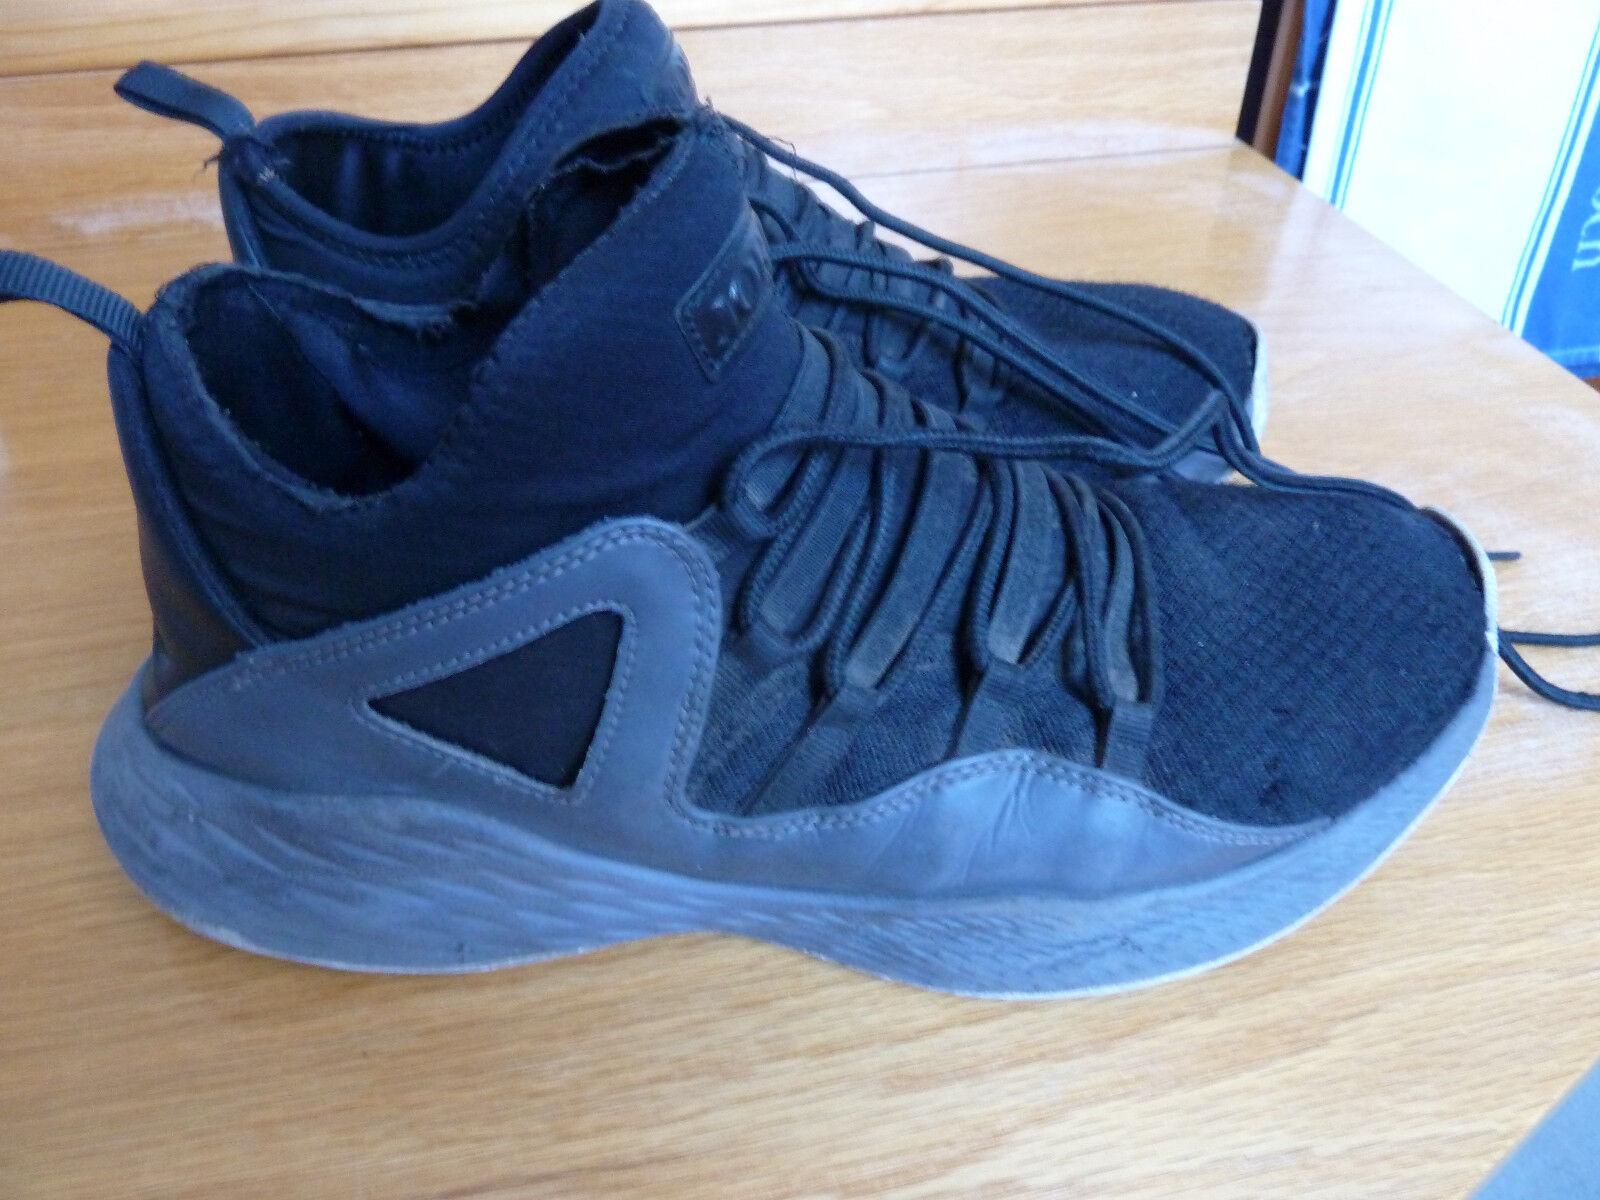 Nike Air Jordan Formula 23 # 881465-021, Gr. 44,5 / cm US 10,5 / 28,5 cm / schwarz Grau 6207e4